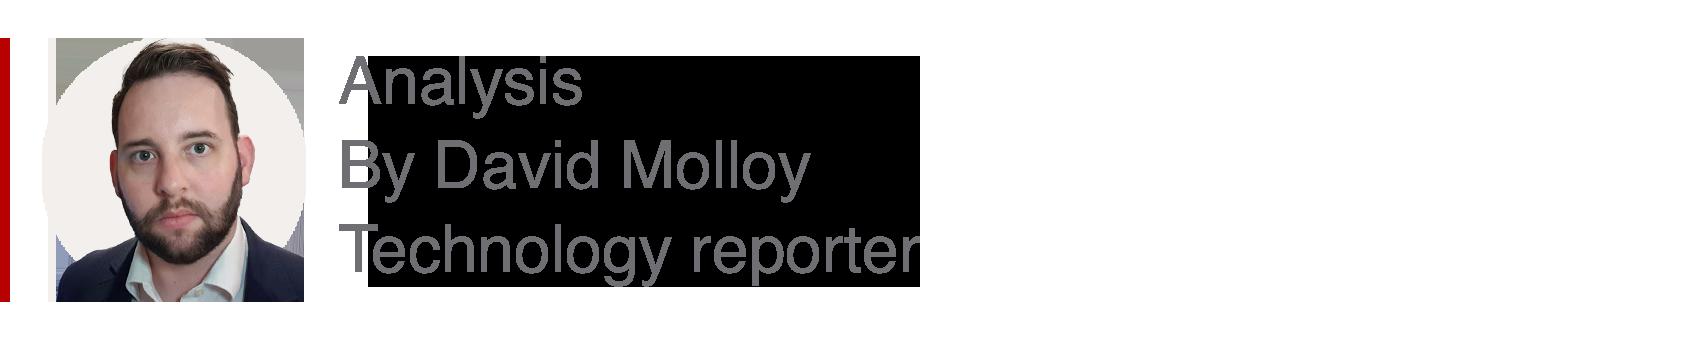 Analysis box by David Molloy, technology reporter